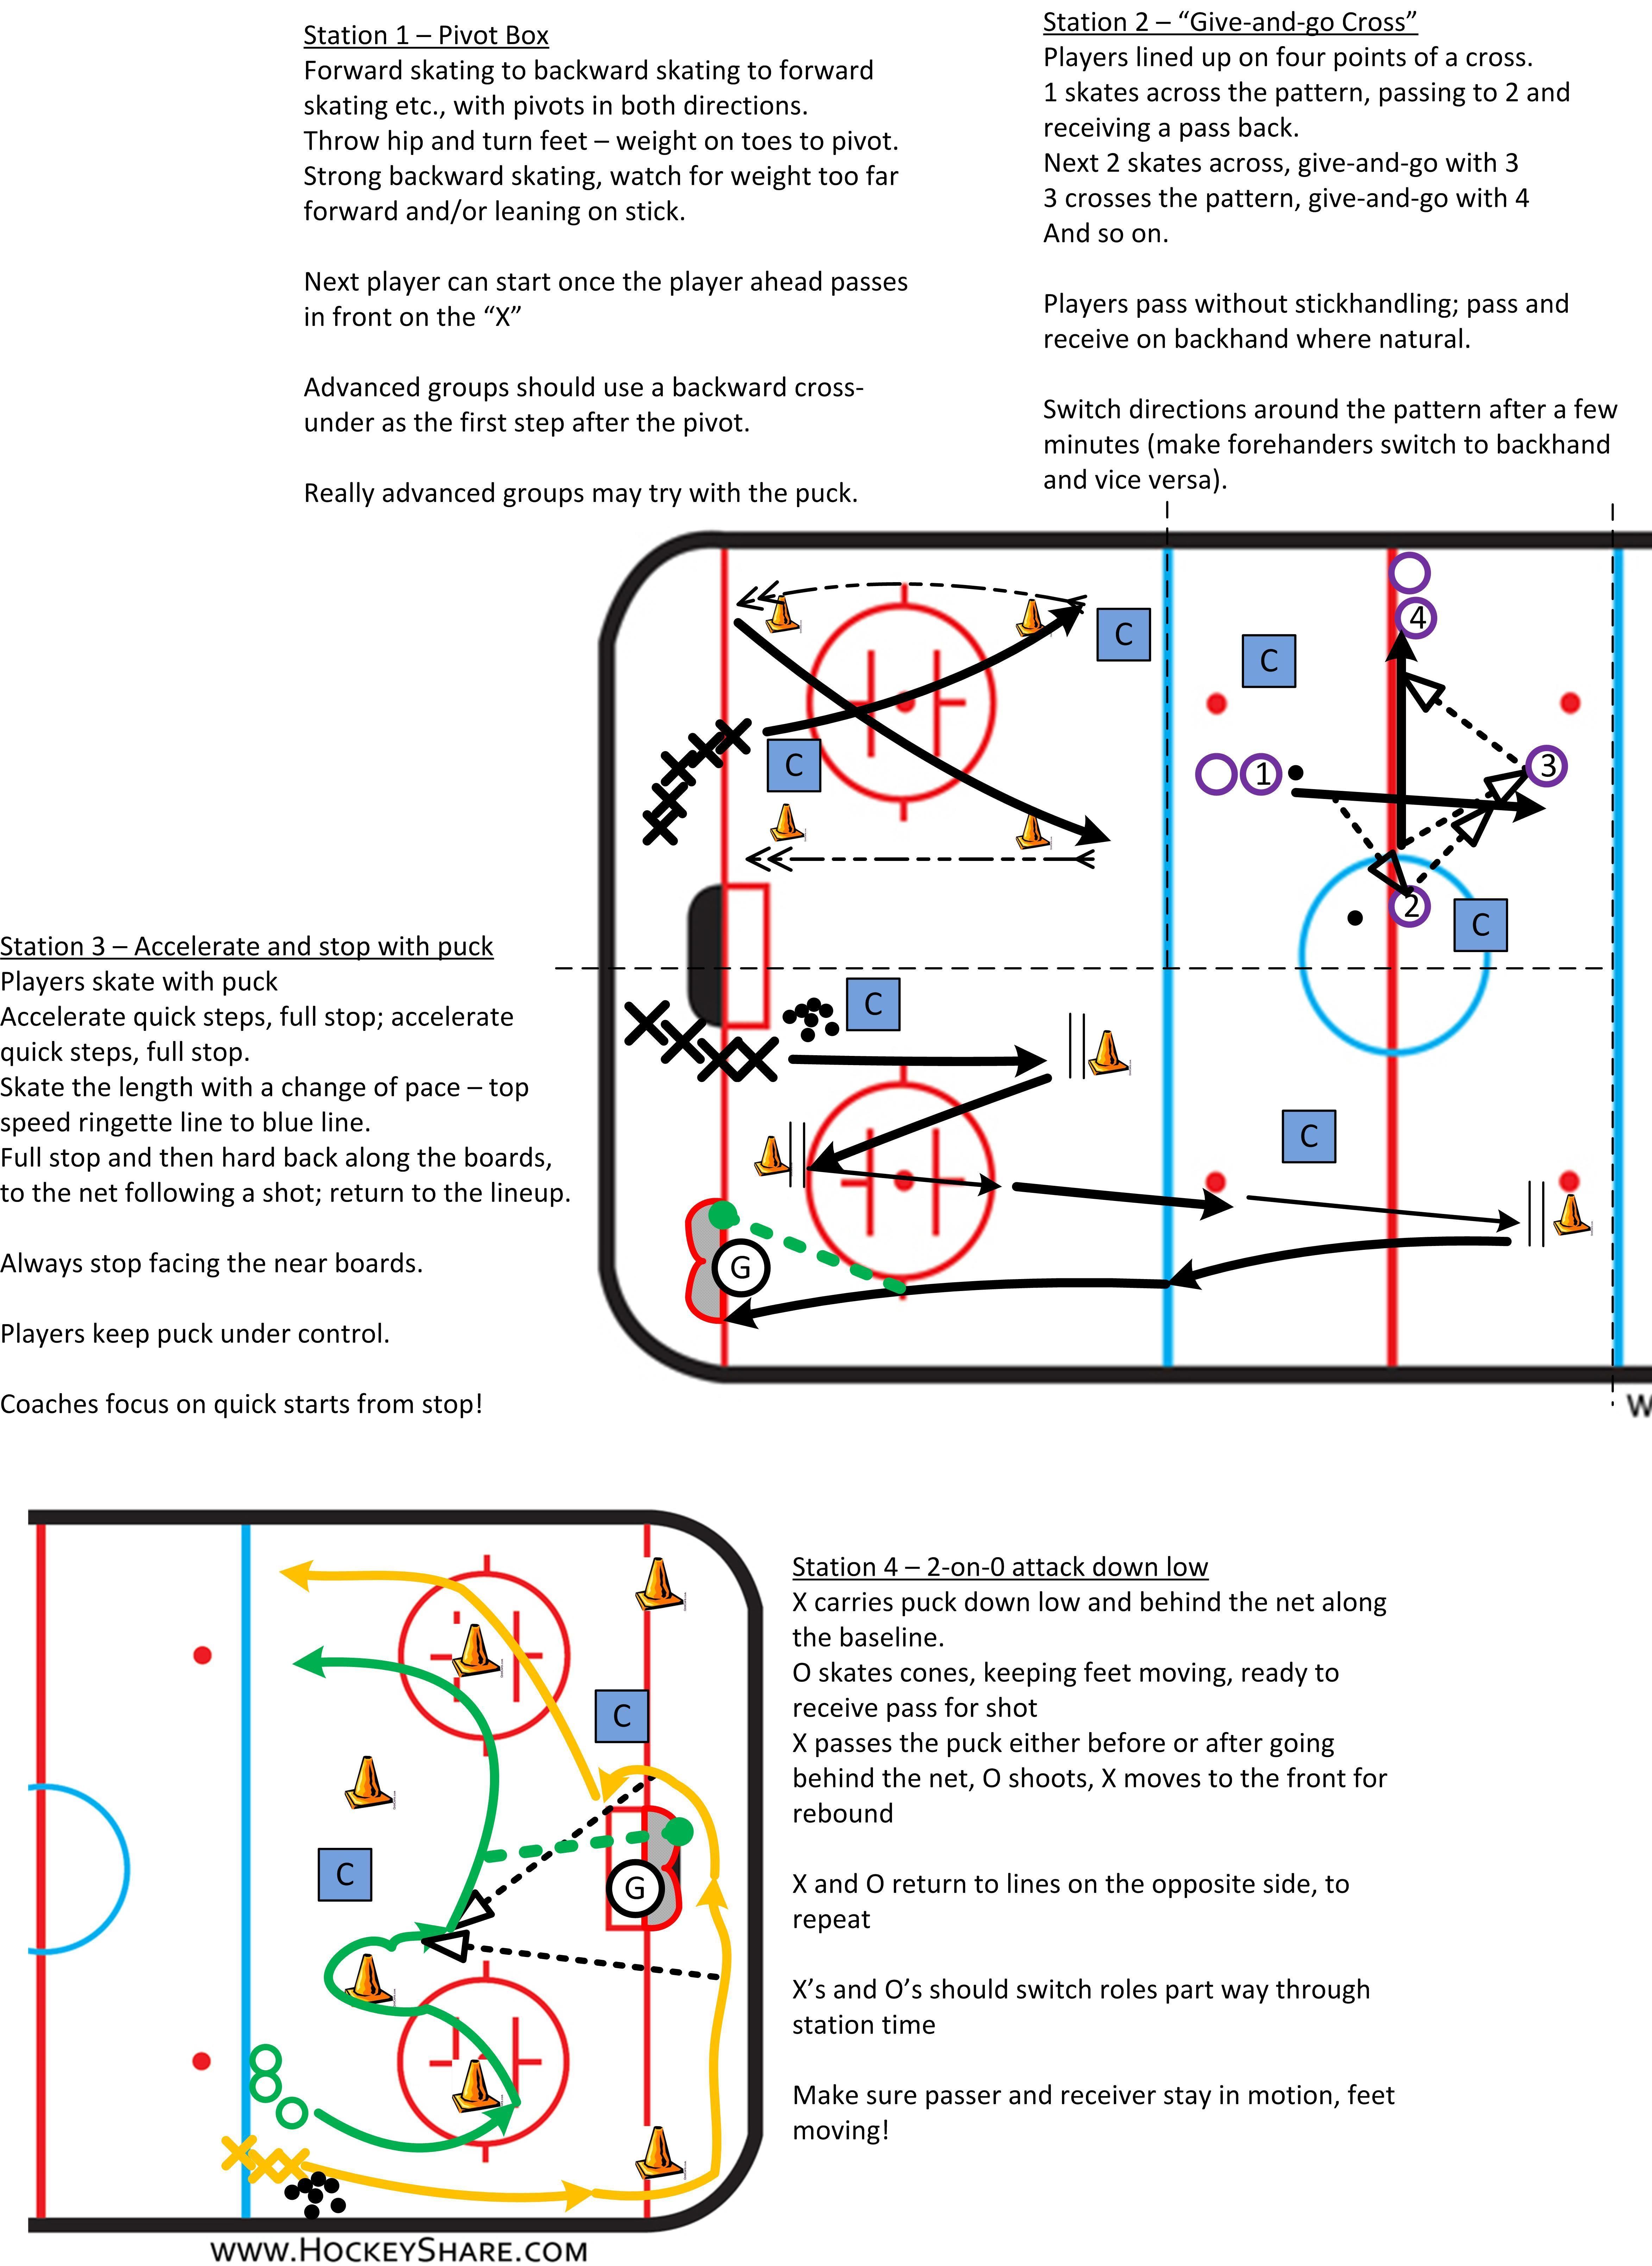 Full Ice Practice Plan For Novice U8 With Four Stations Fairly Advanced Hockey Equipment Hockey Training Hockey